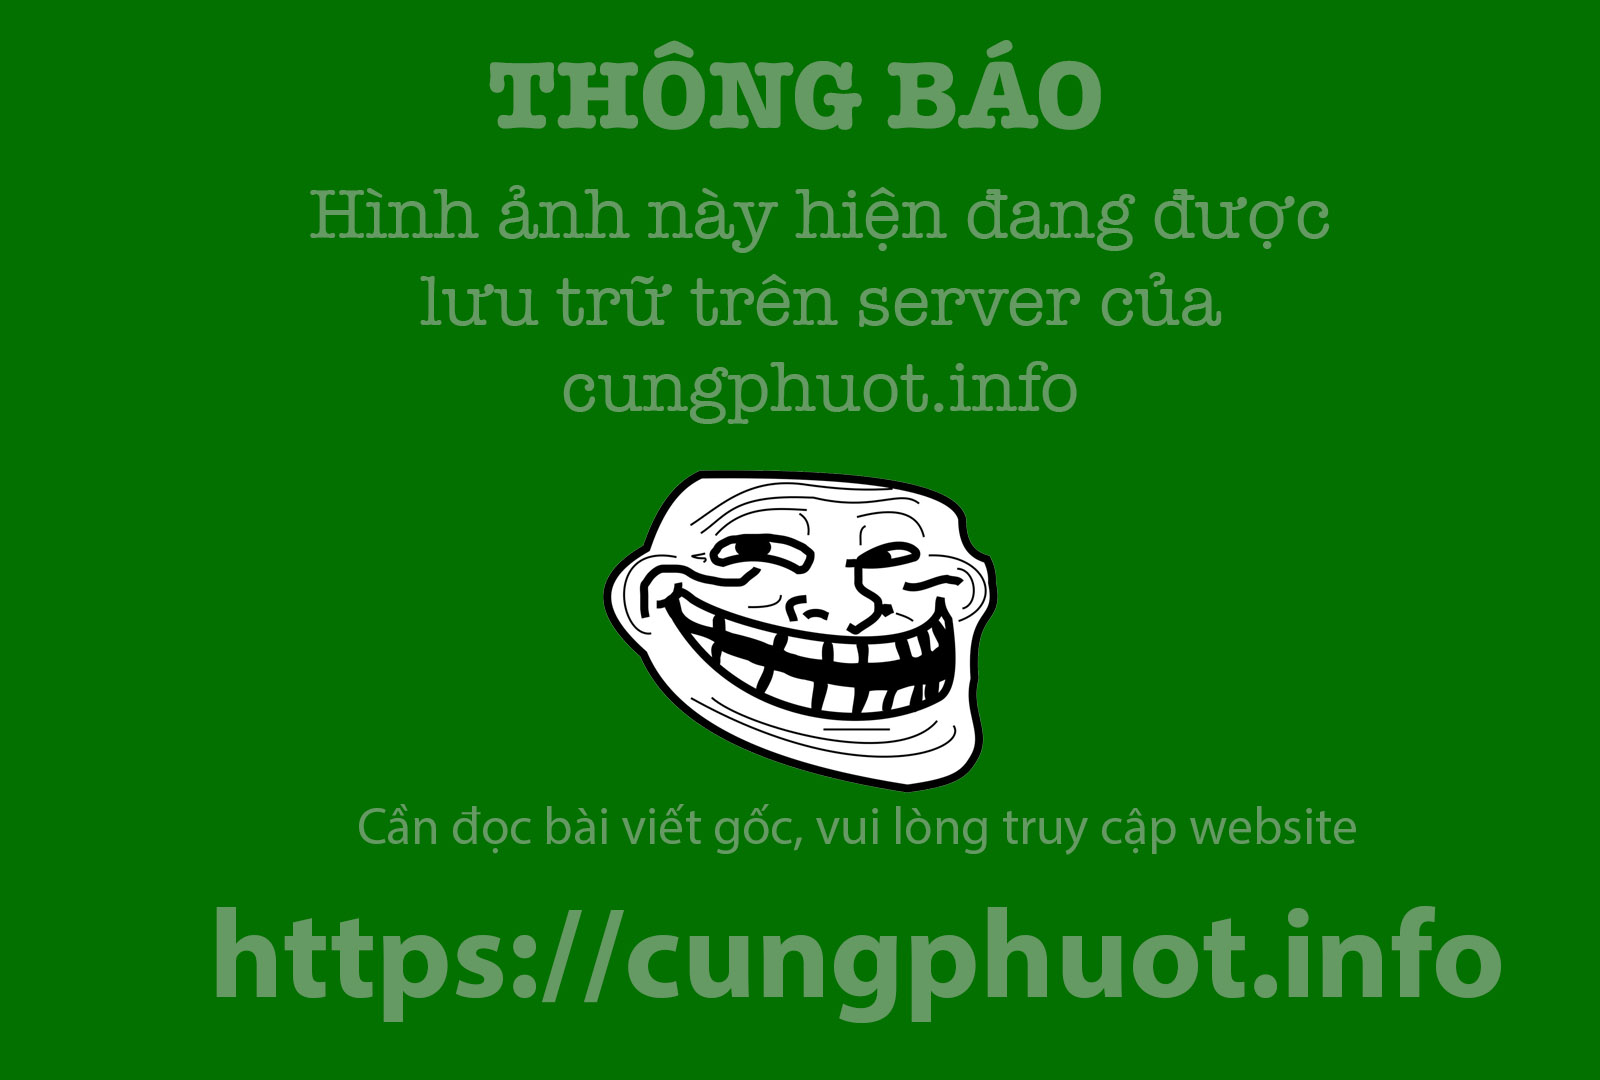 Co do Lam Kinh nhin tu tren cao hinh anh 3